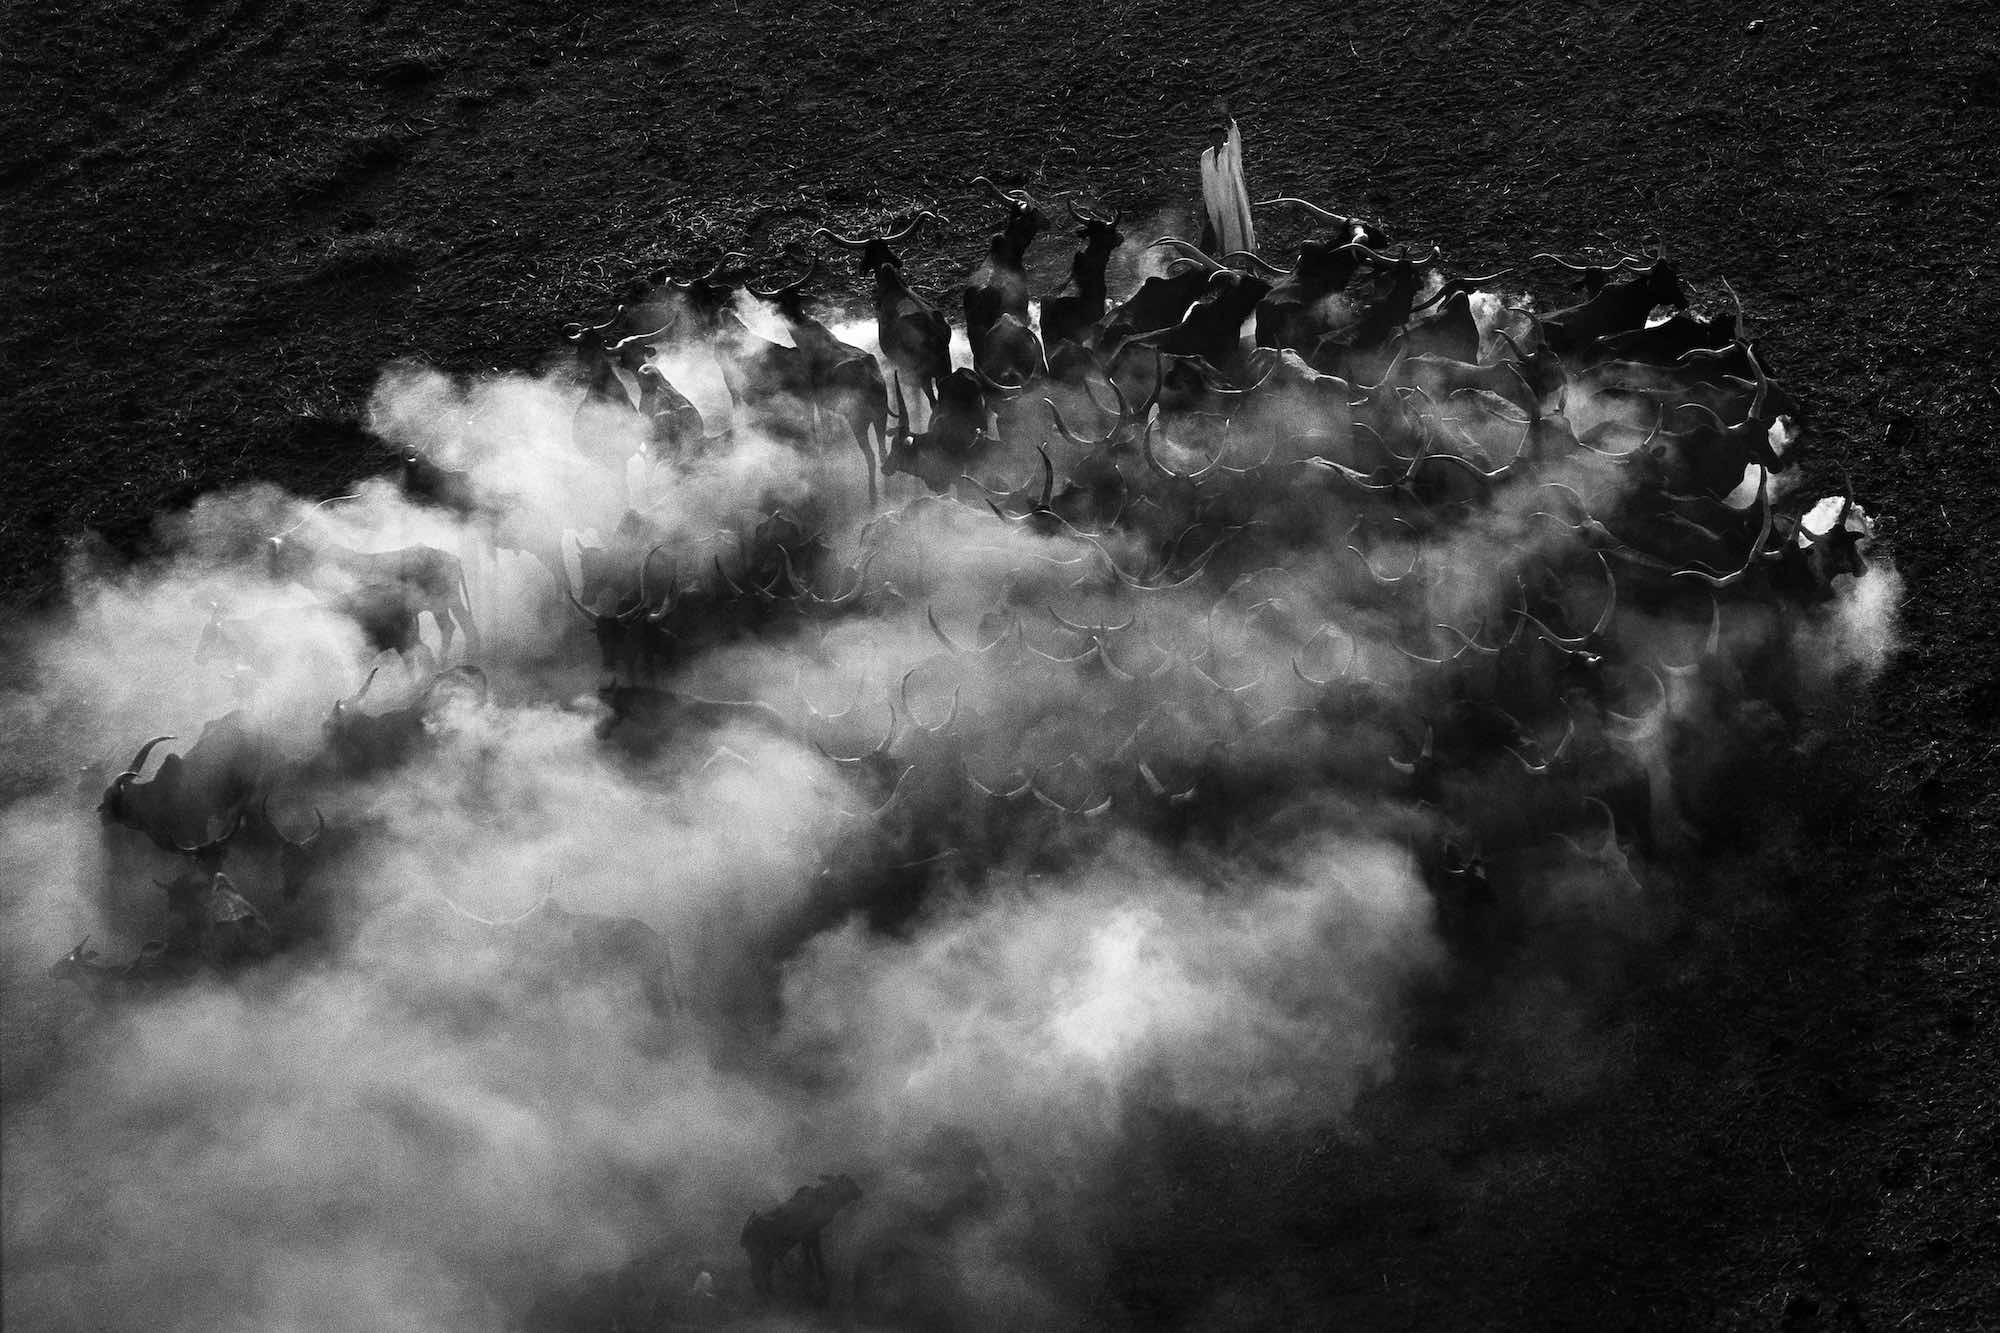 Nomad - Yann Arthus-Bertrand